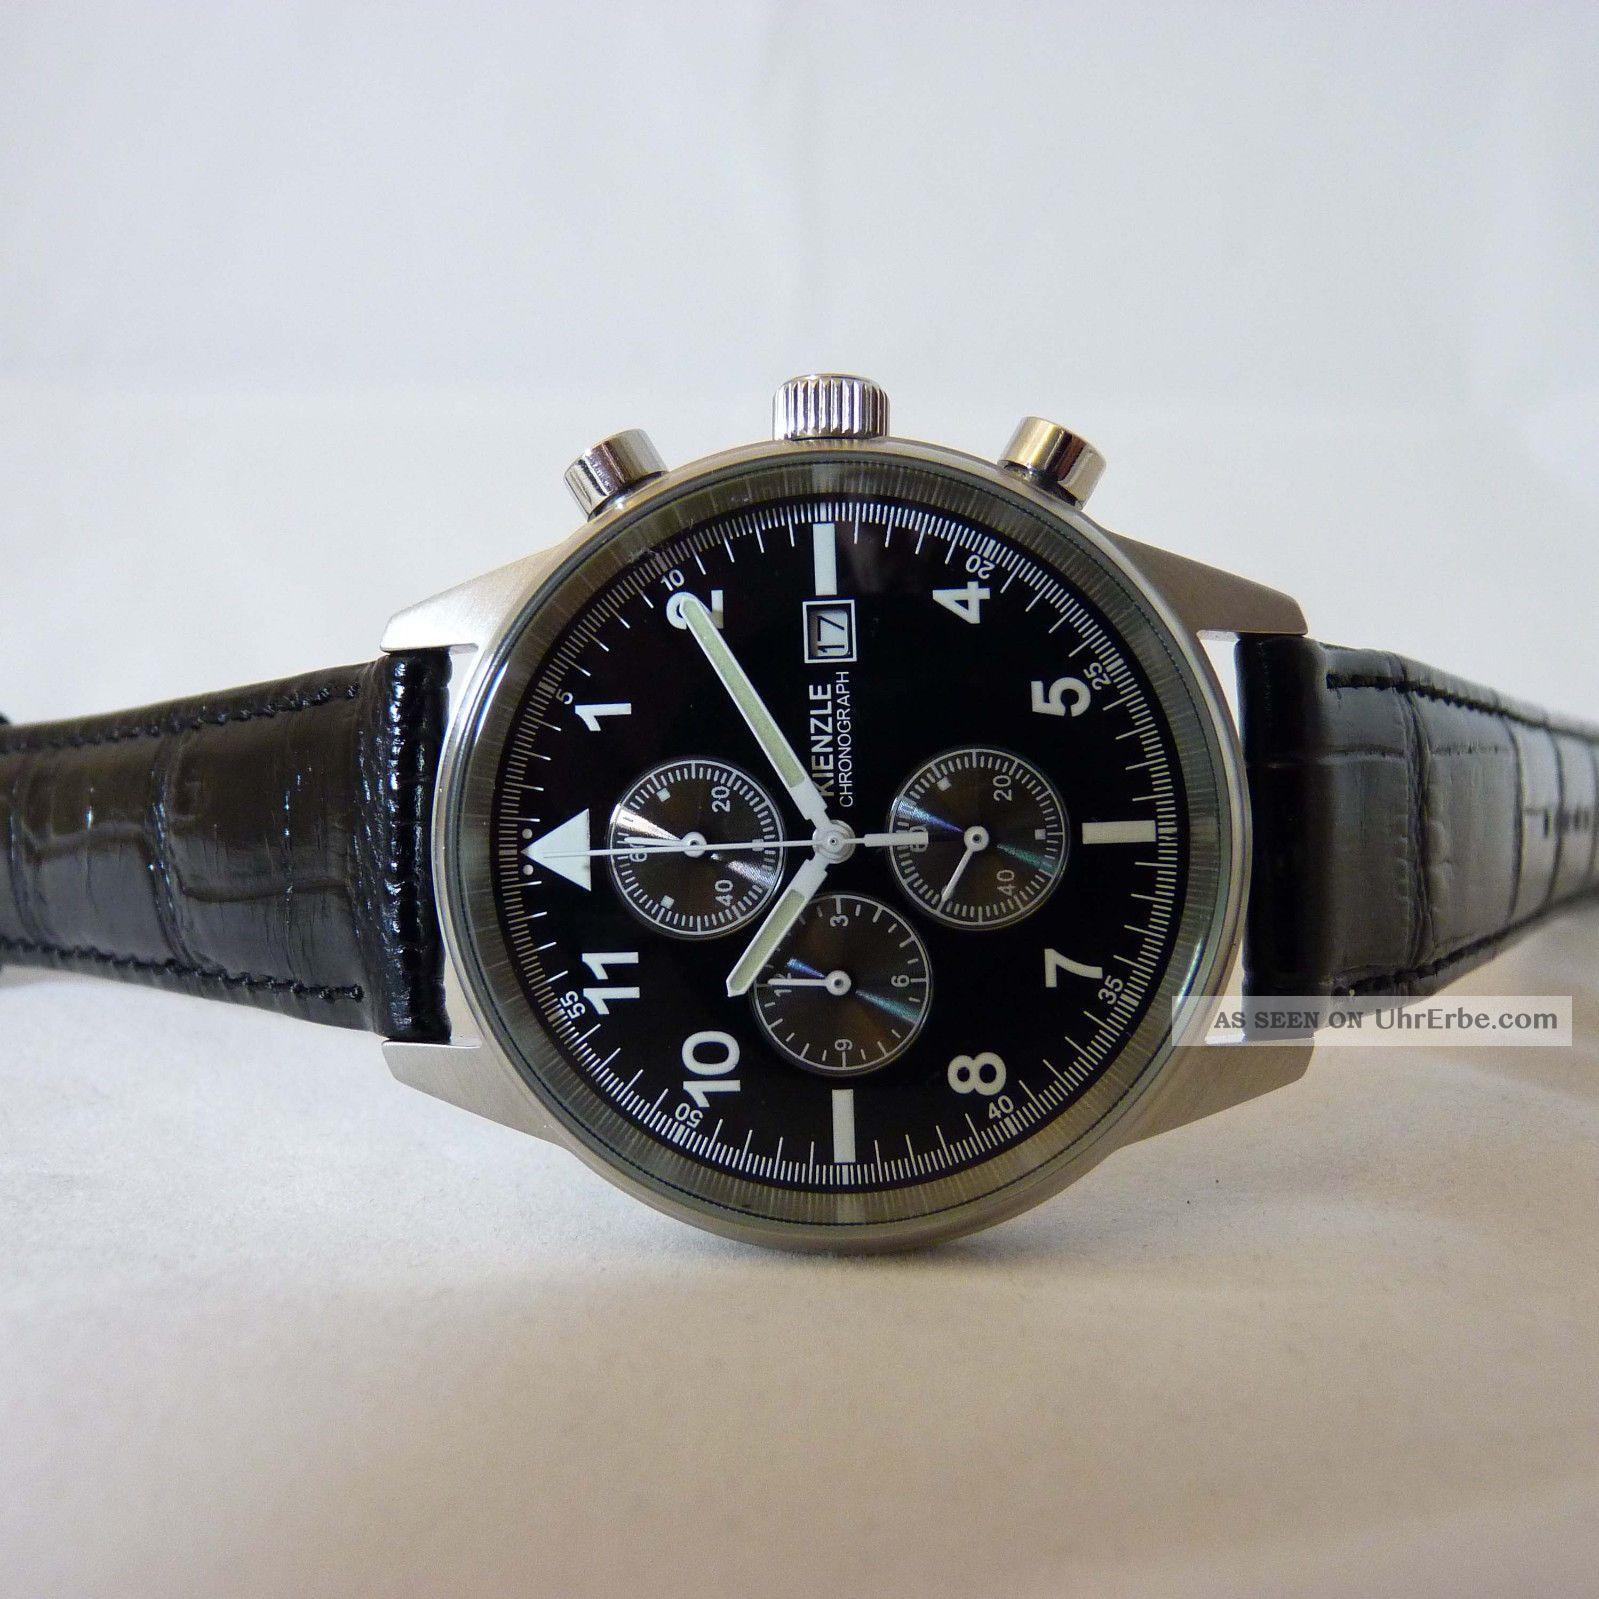 Kienzle Herren Armbanduhr Quartz Chronograph Mit Datumsfunktion Armbanduhren Bild